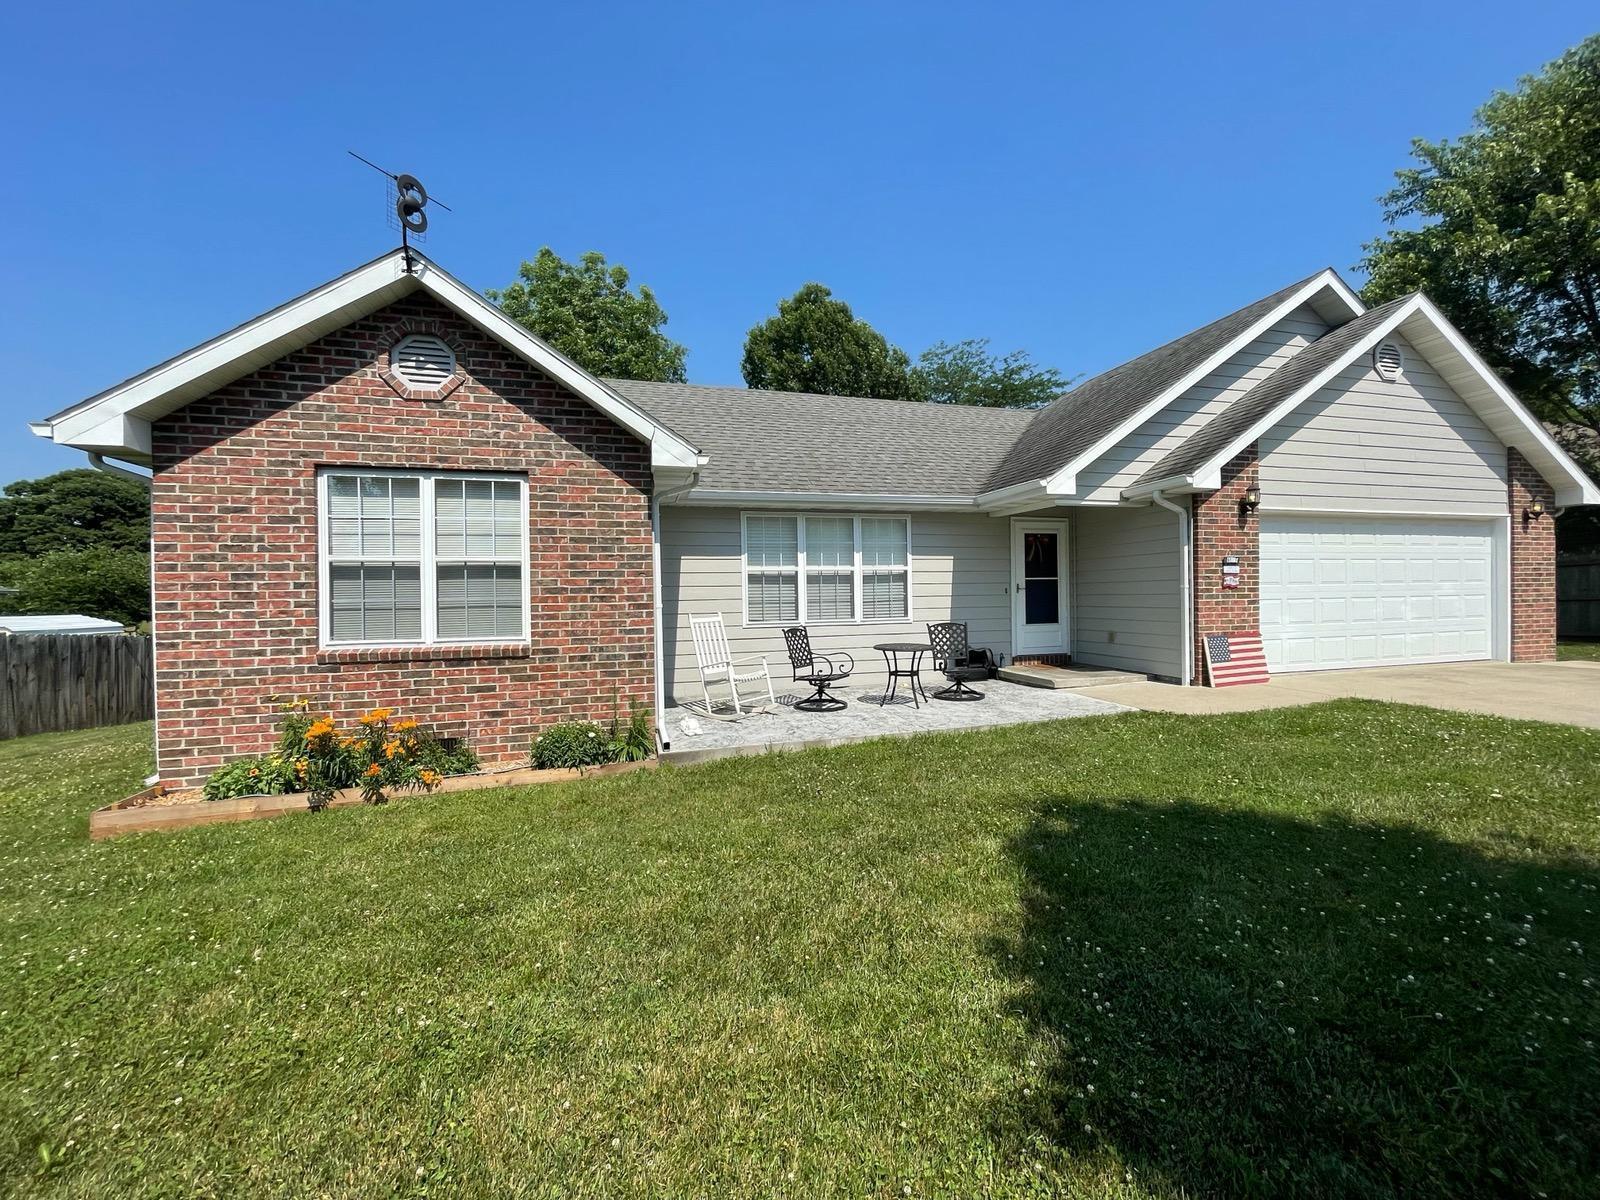 758 North Olive Street, Marshfield, Missouri 65706